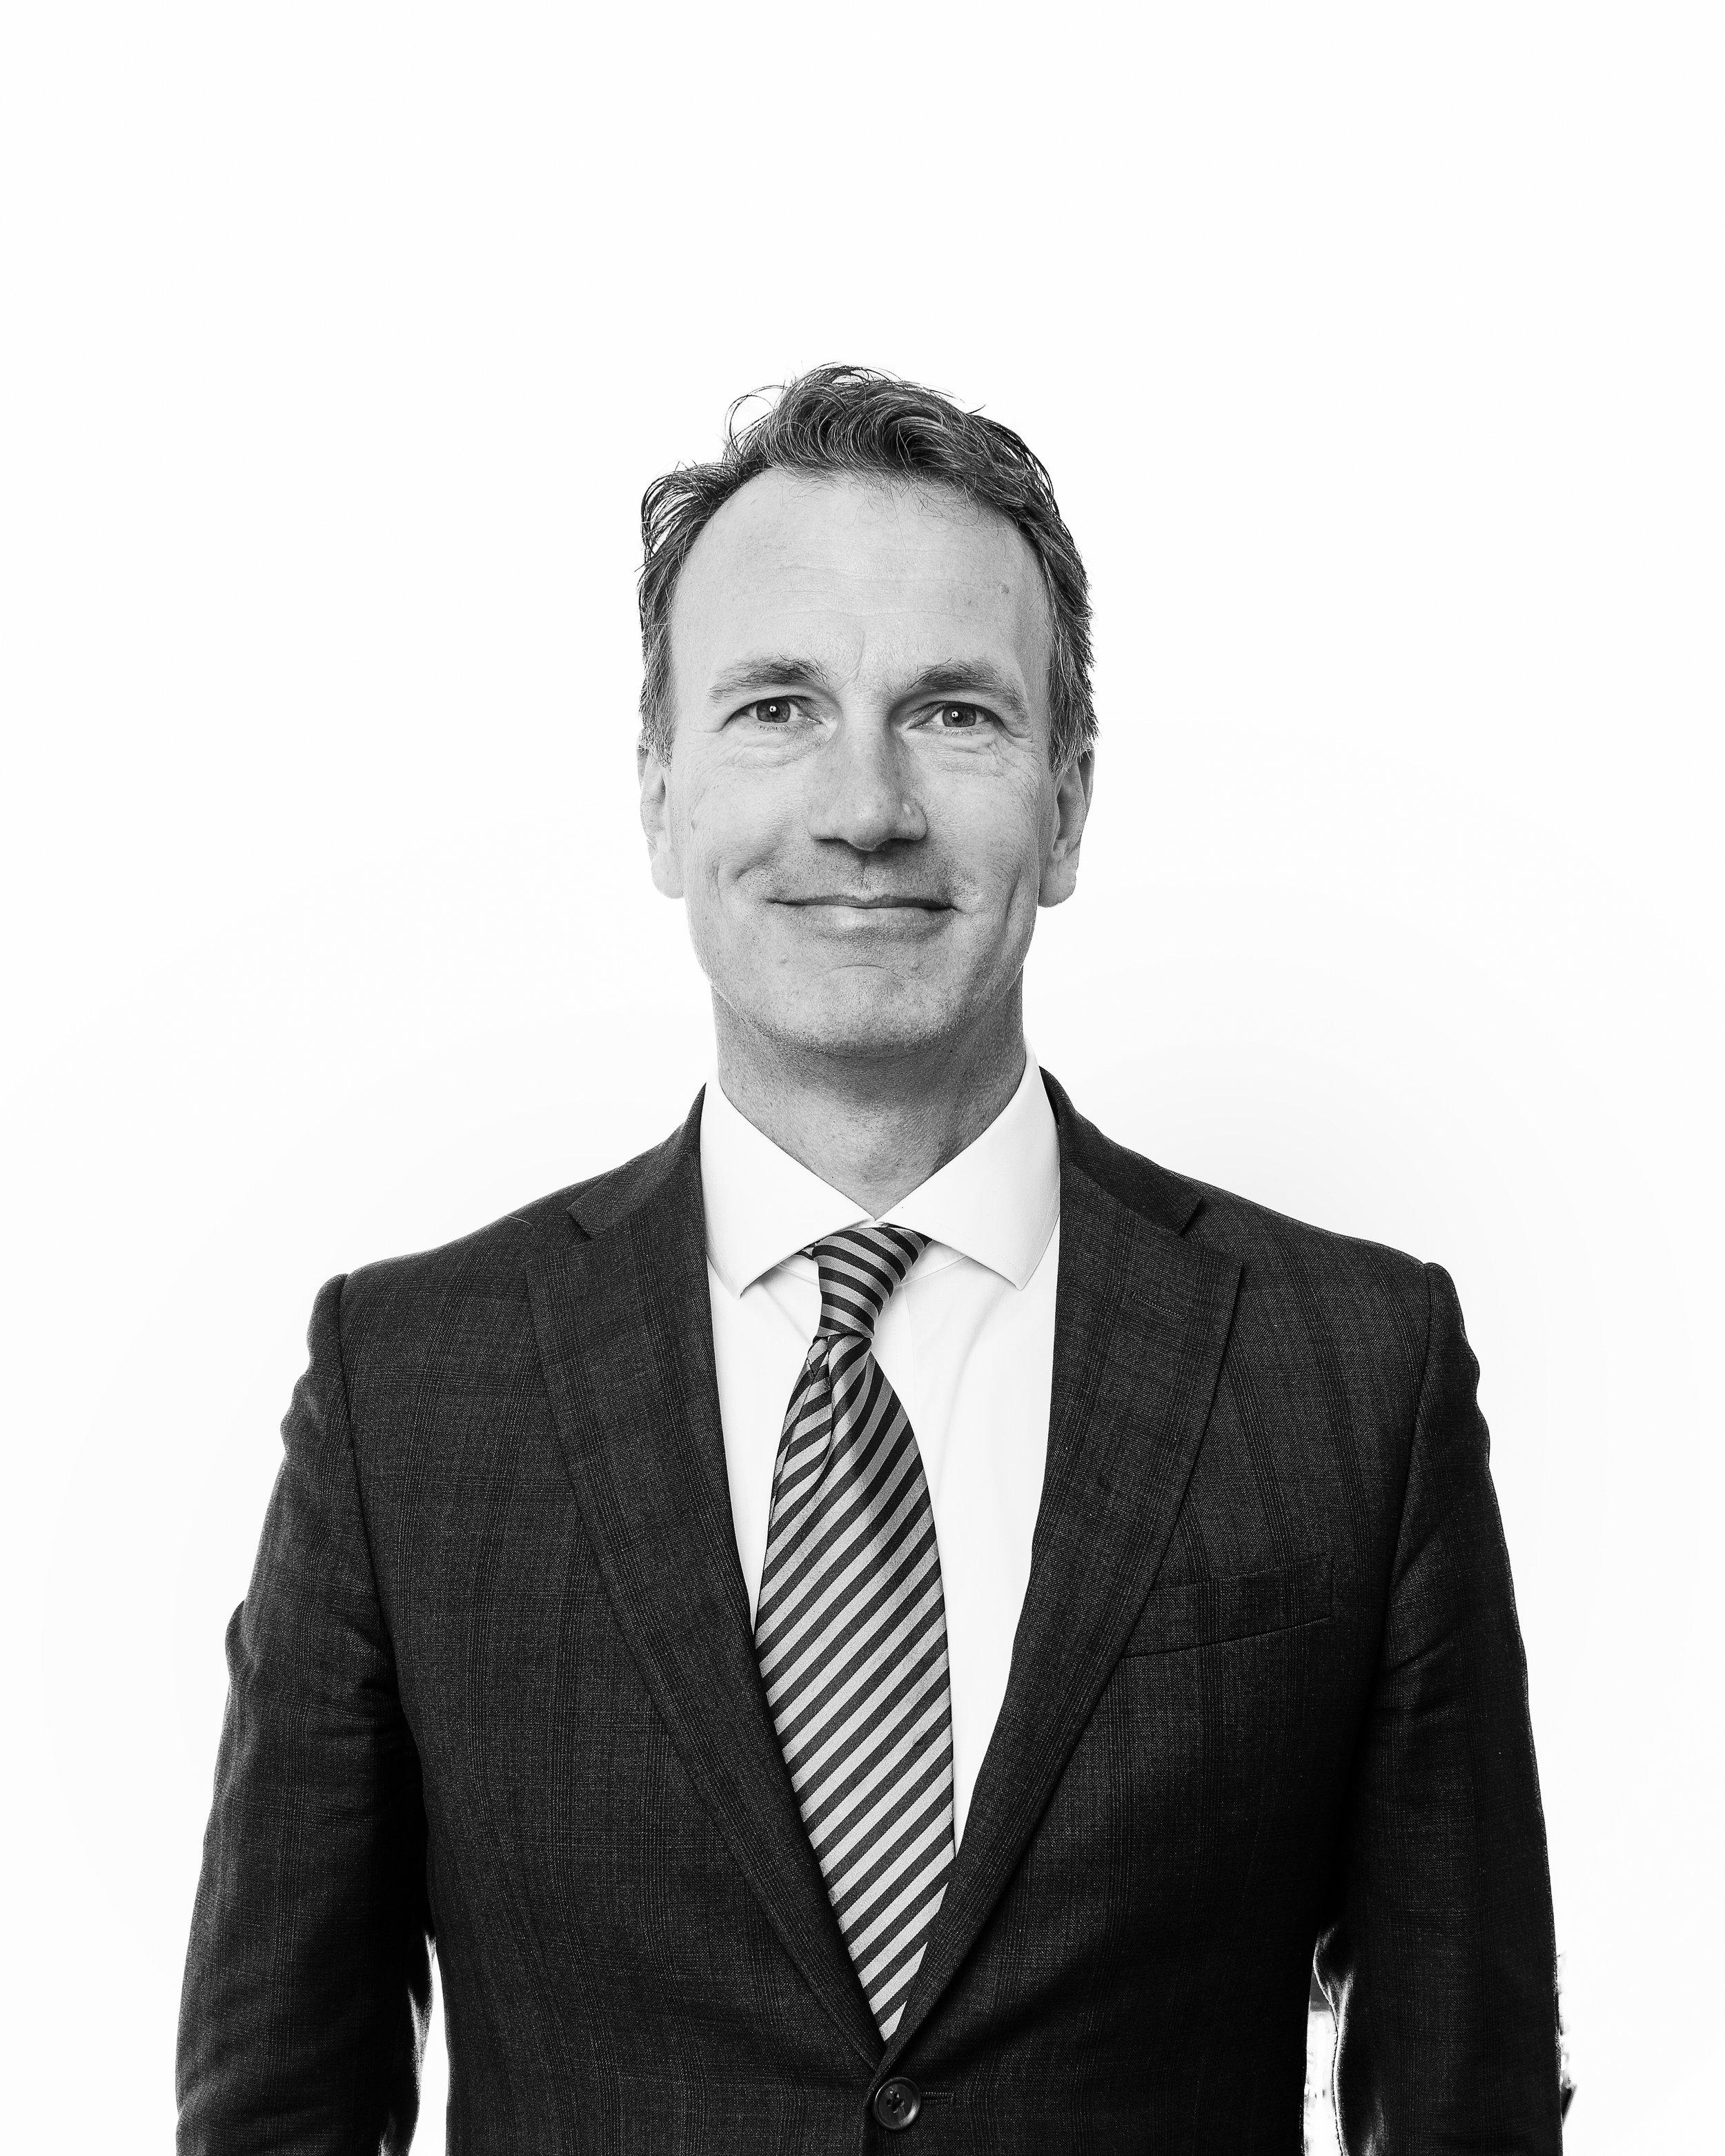 Klaus Værnø